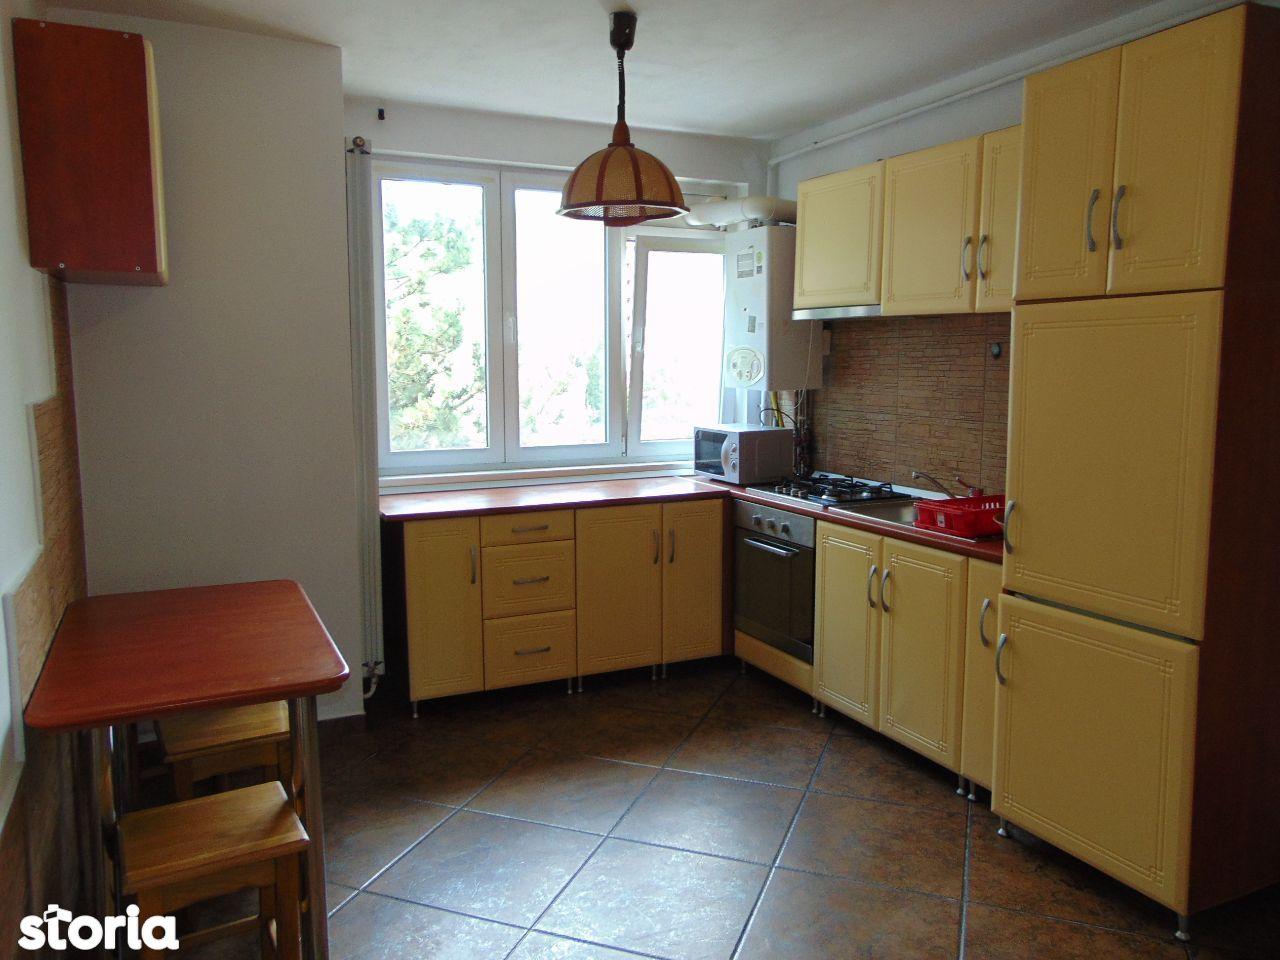 BB/220 Apartament cu 2 camere în Tudor